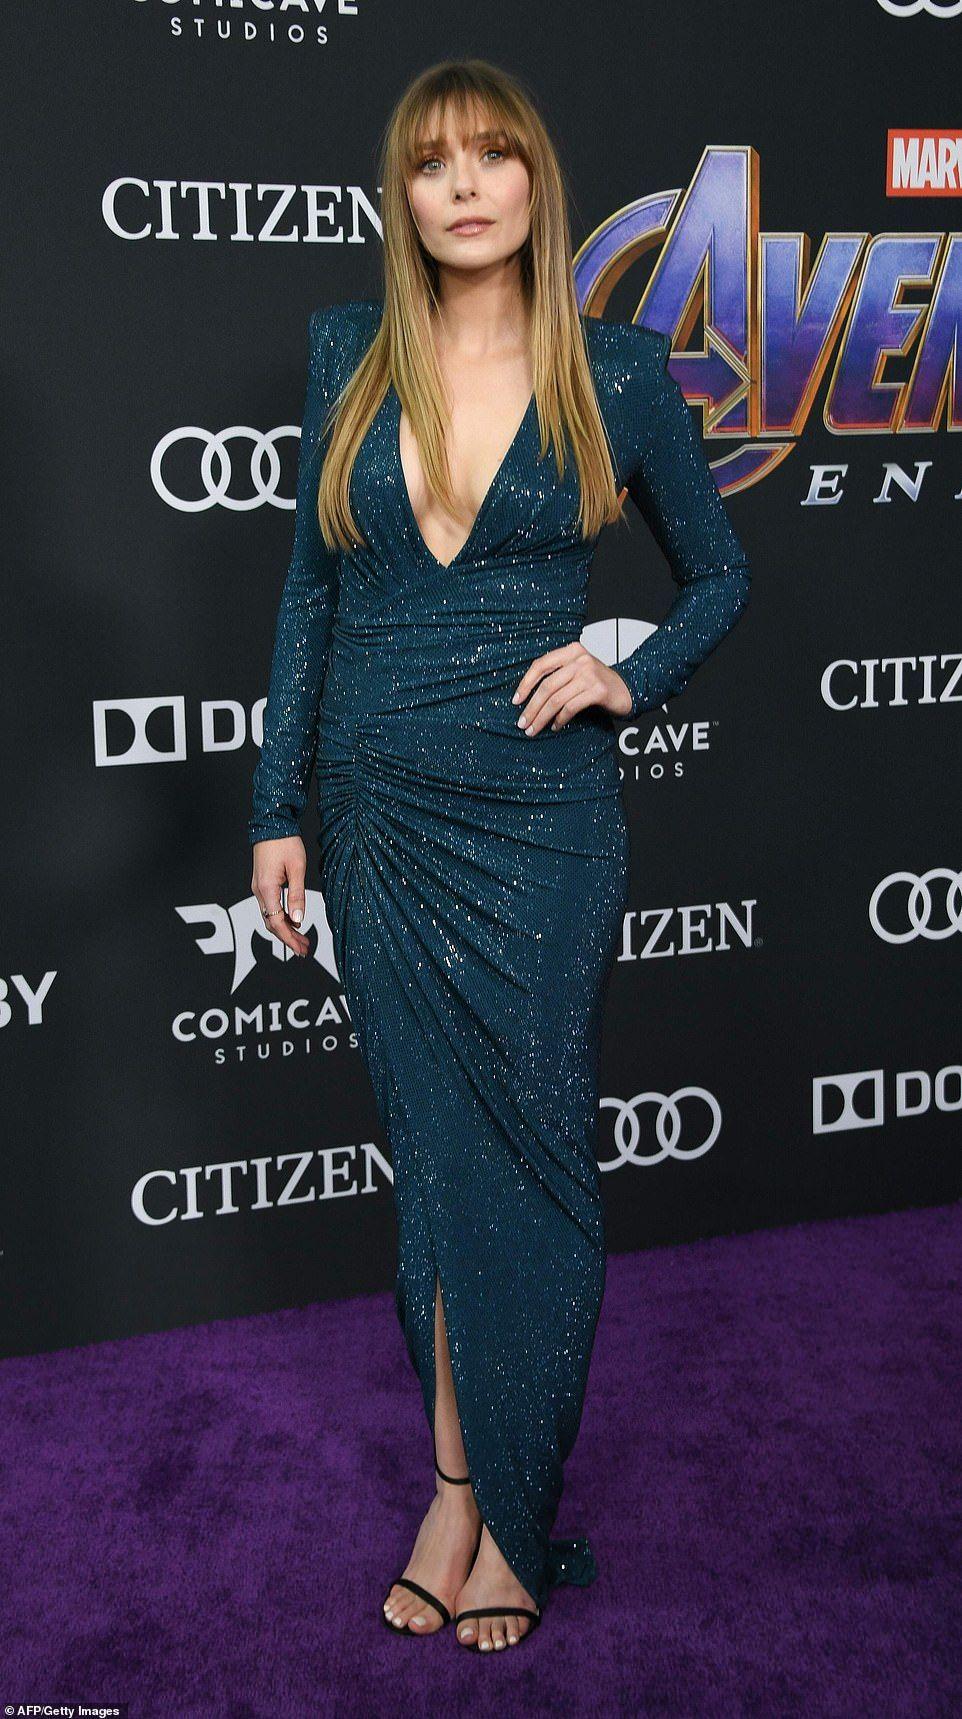 Scarlett Johansson Brie Larson Dazzle At Avengers Endgame Premiere Elizabeth Olsen Elizabeth Olsen Scarlet Witch Olsen